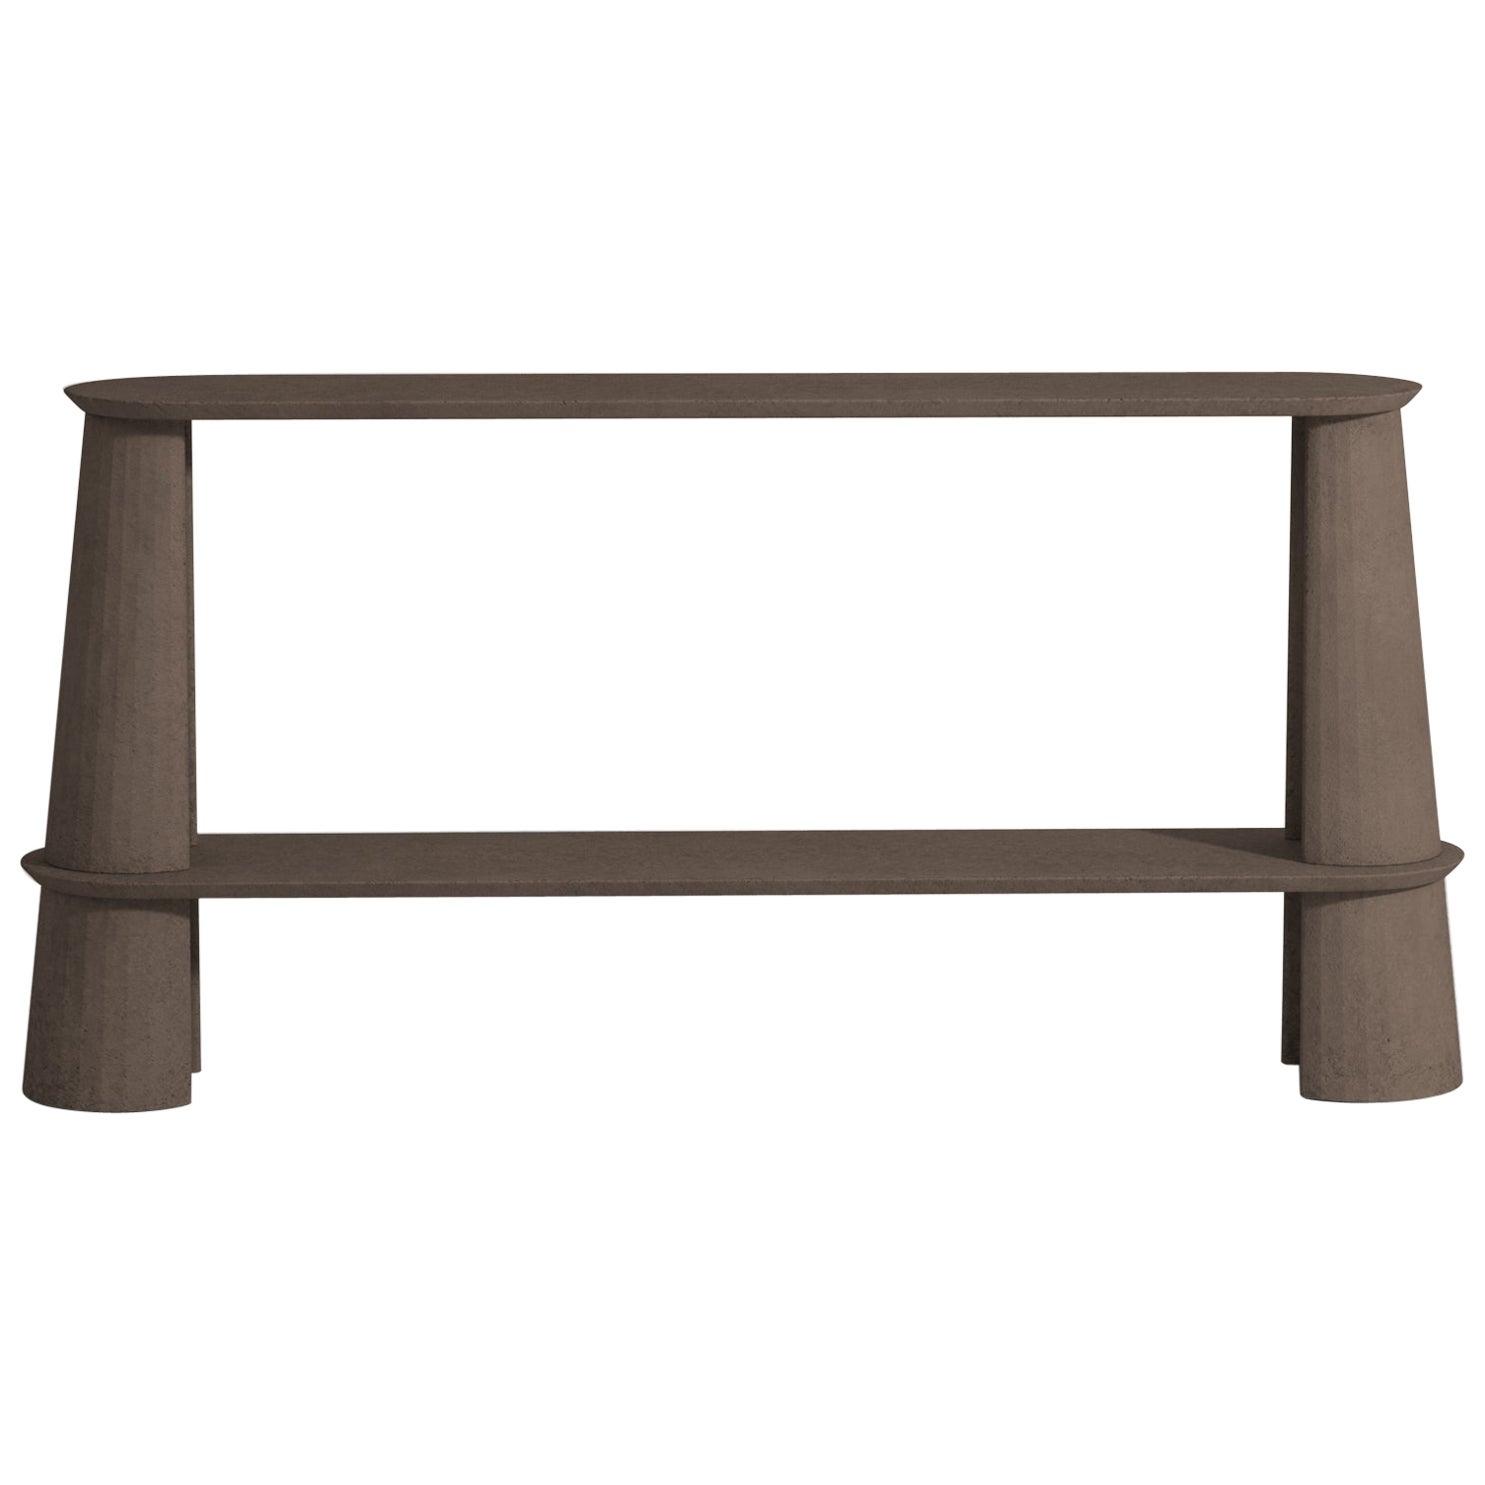 21st Century Studio Irvine Fusto Side Console Table Concrete Cement Brown Color